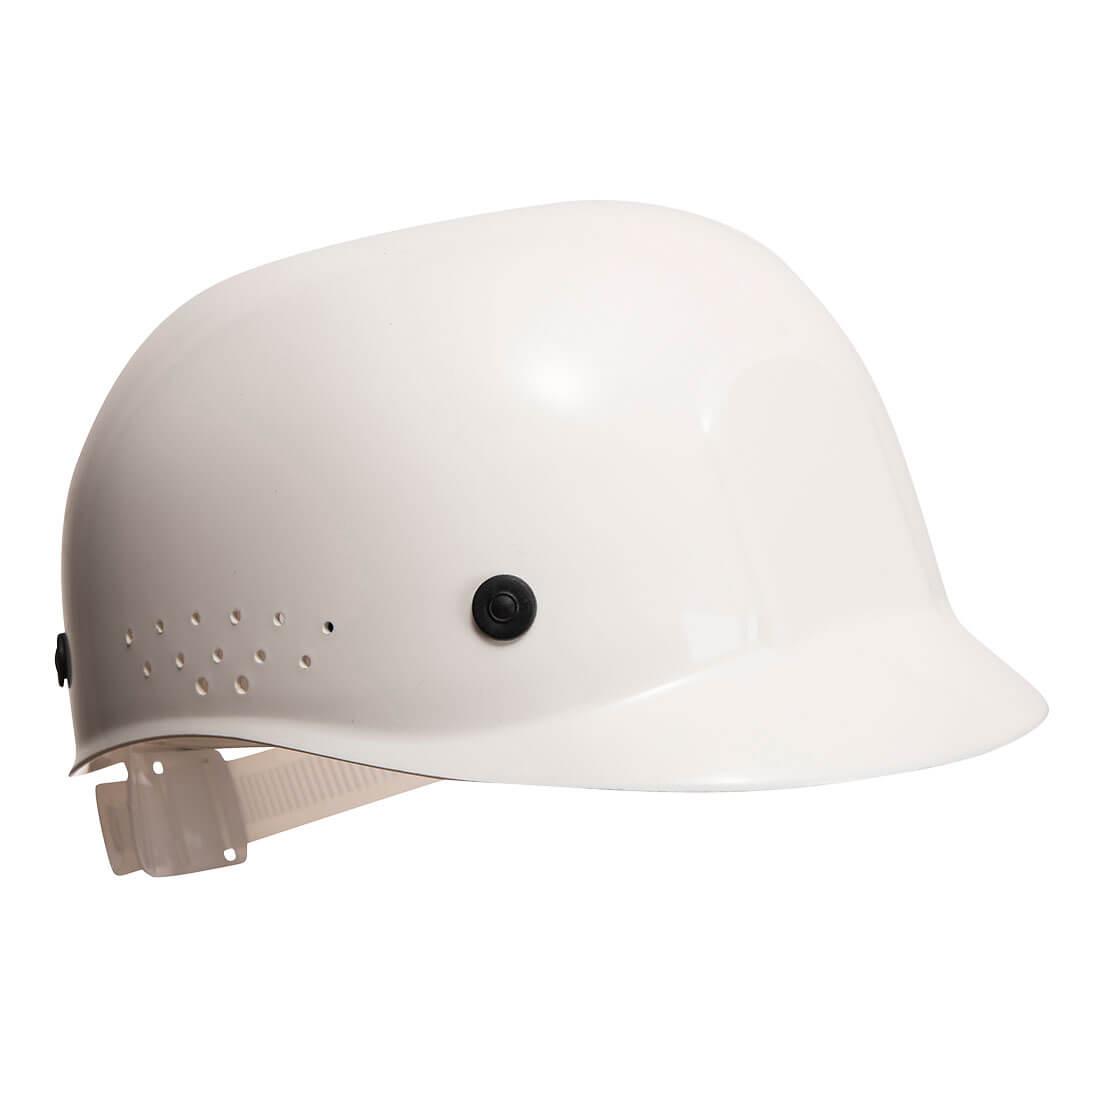 Head Protection, Bump Cap